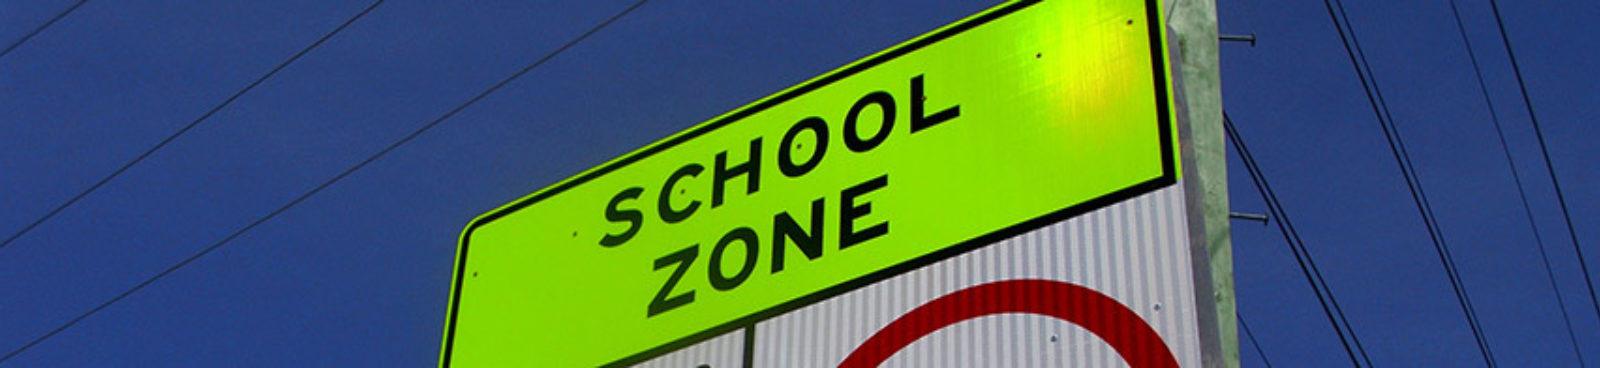 New Fluorescent School Zone Sign Blog